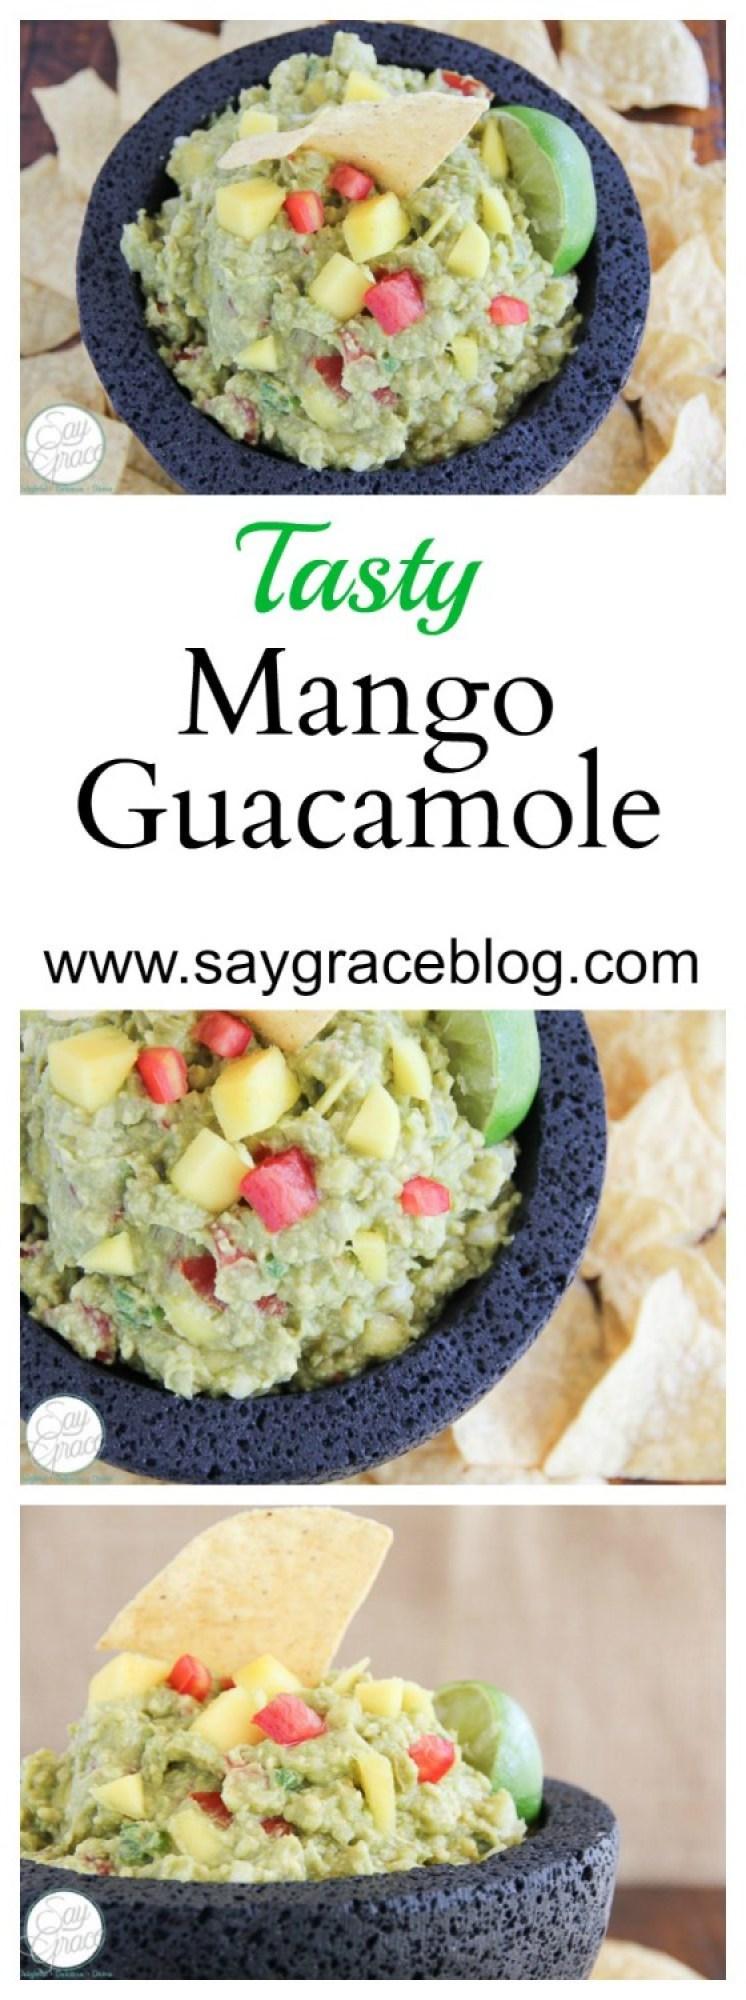 Tasty Mango Guacamole